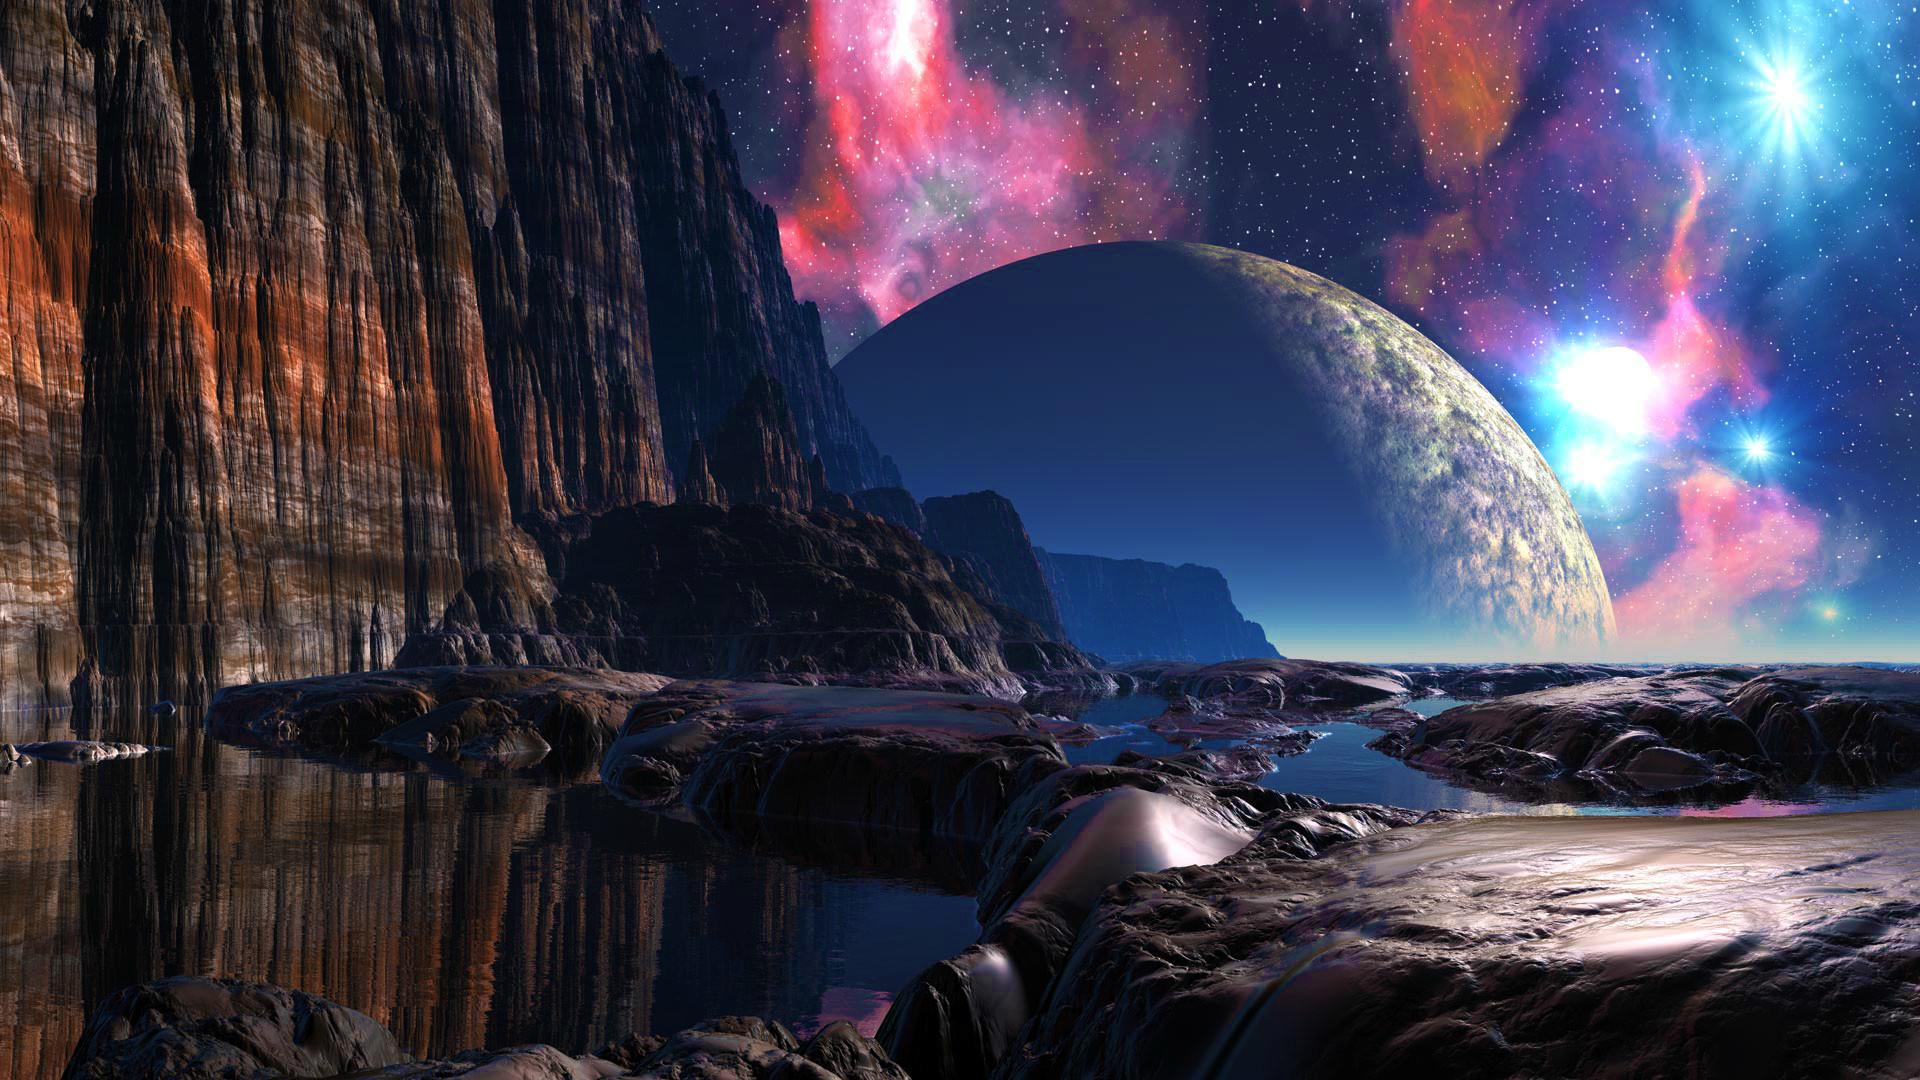 Fantasy World Ipad Wallpaper: Fantasy Planet Wallpaper ·① WallpaperTag